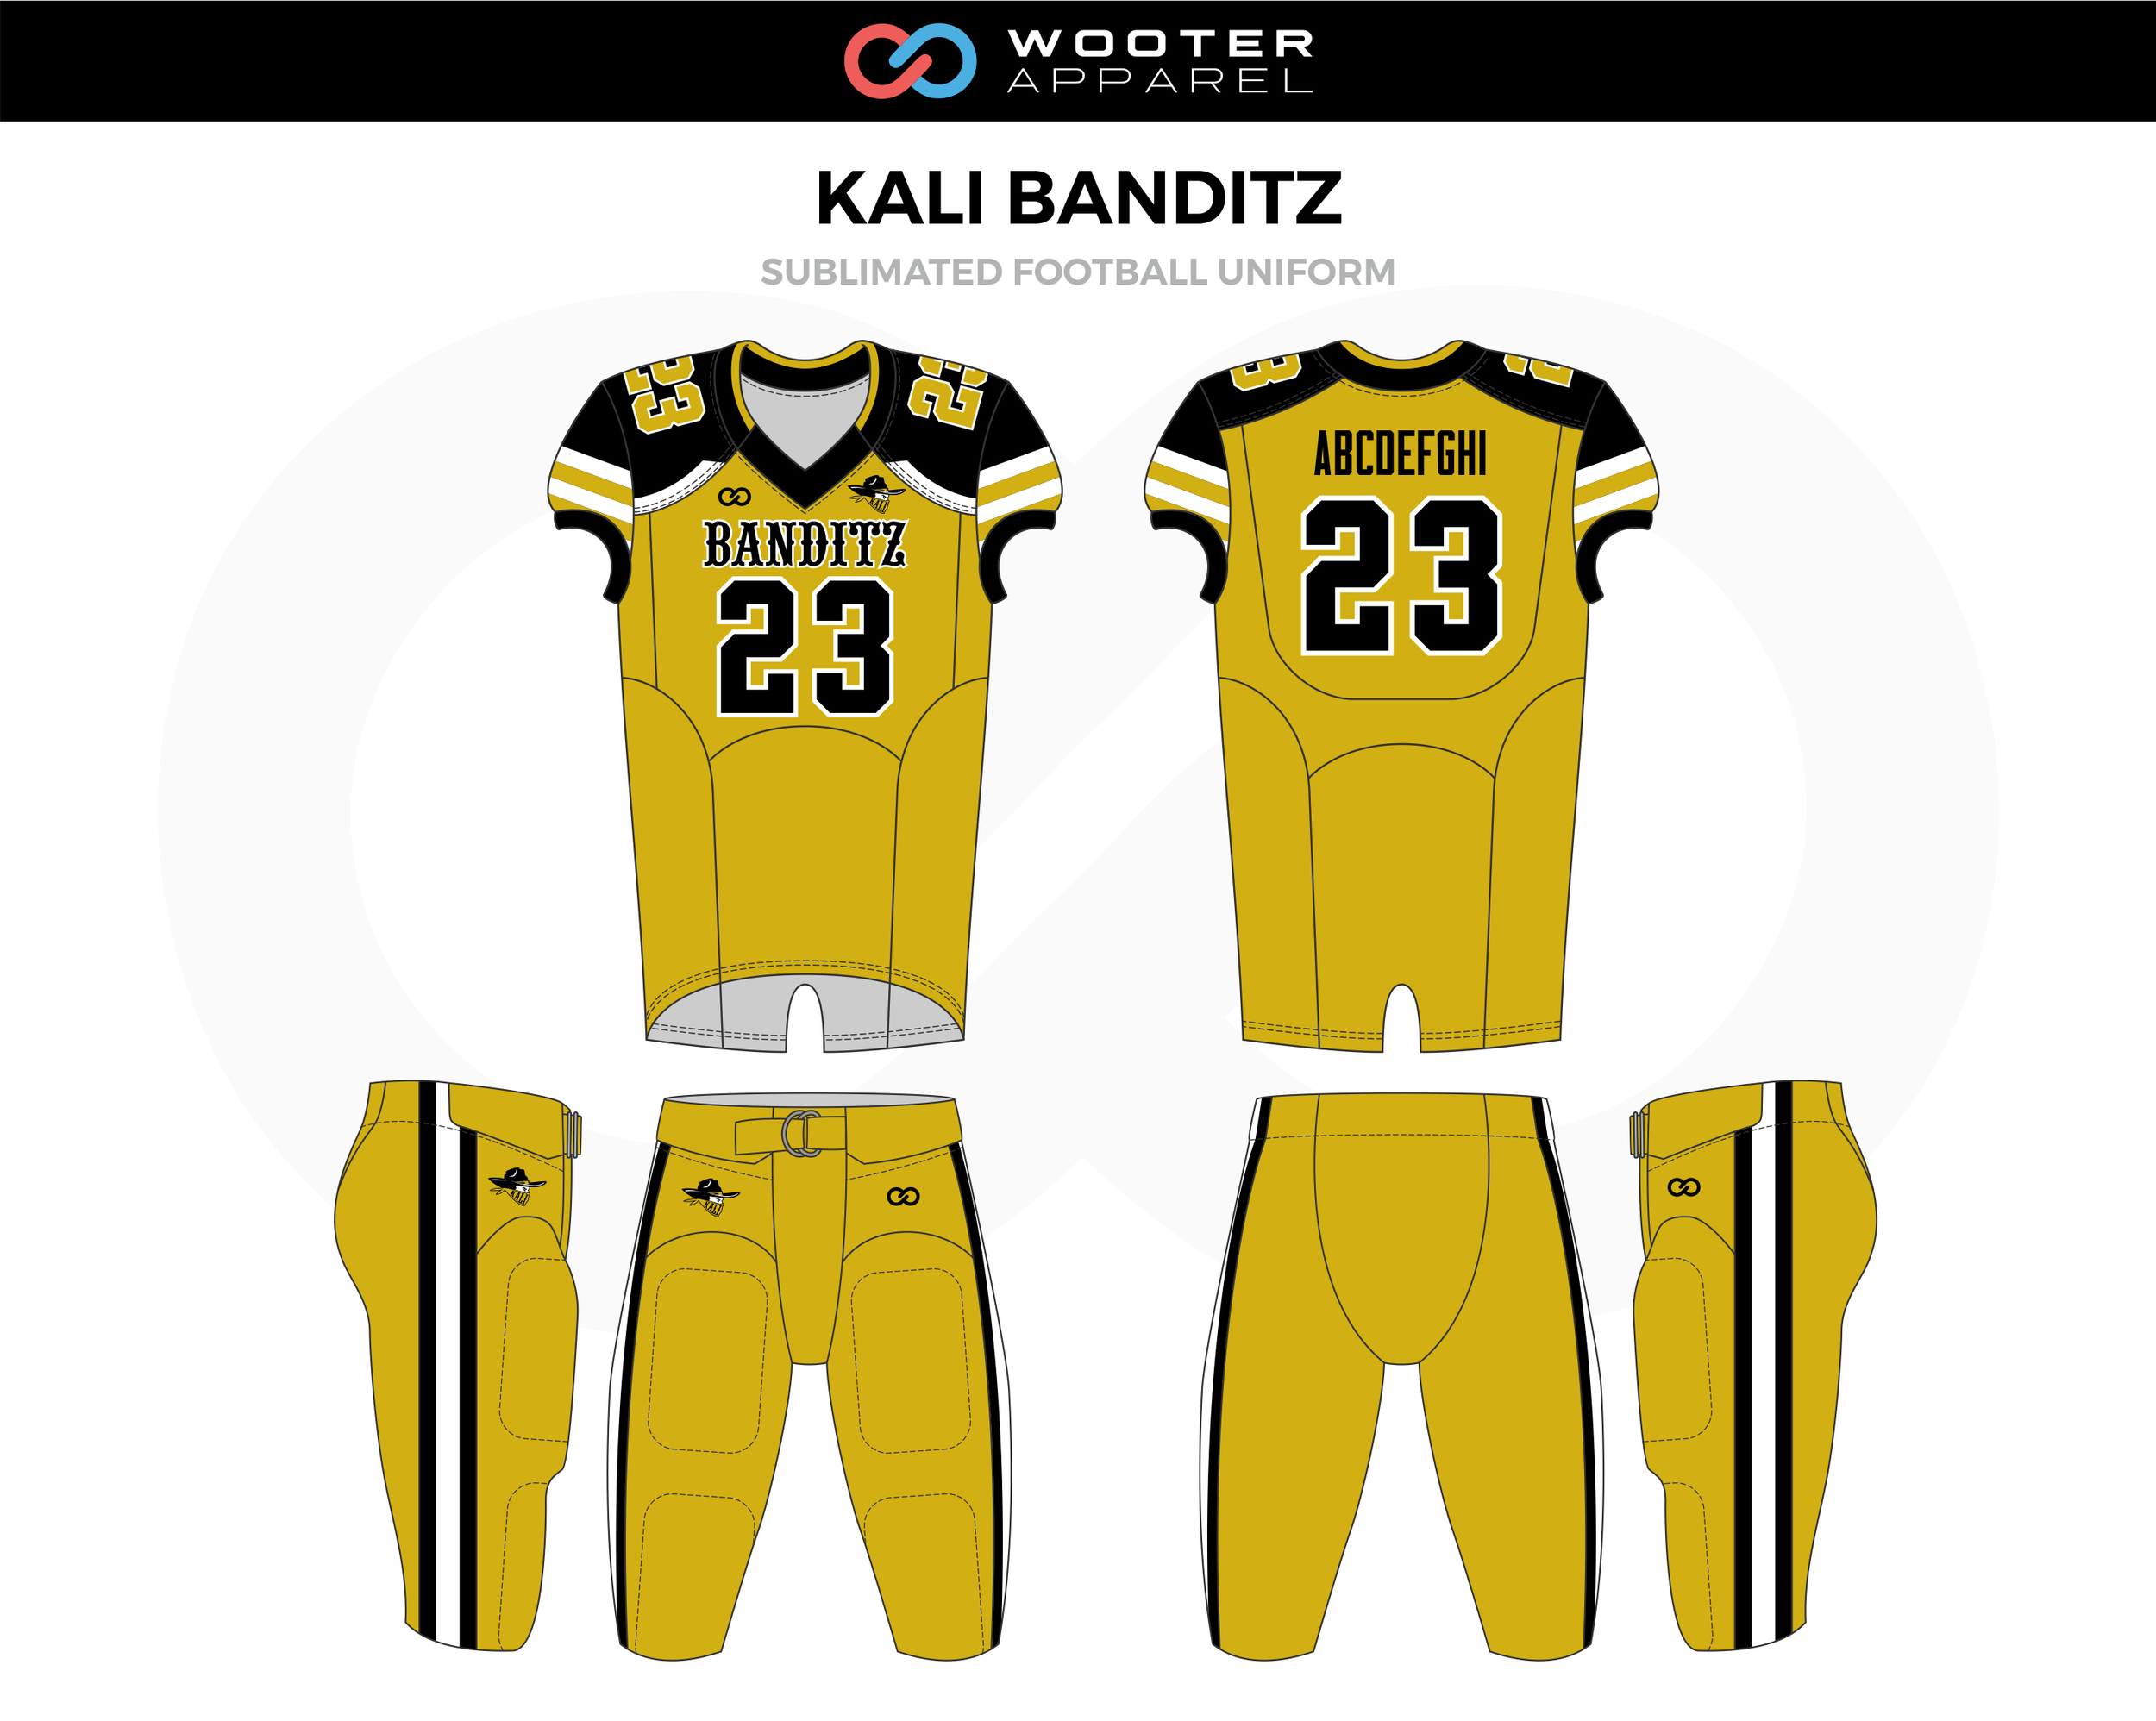 KALI BANDITZ Yellow Black White Football Uniform, Jerseys, and Pants